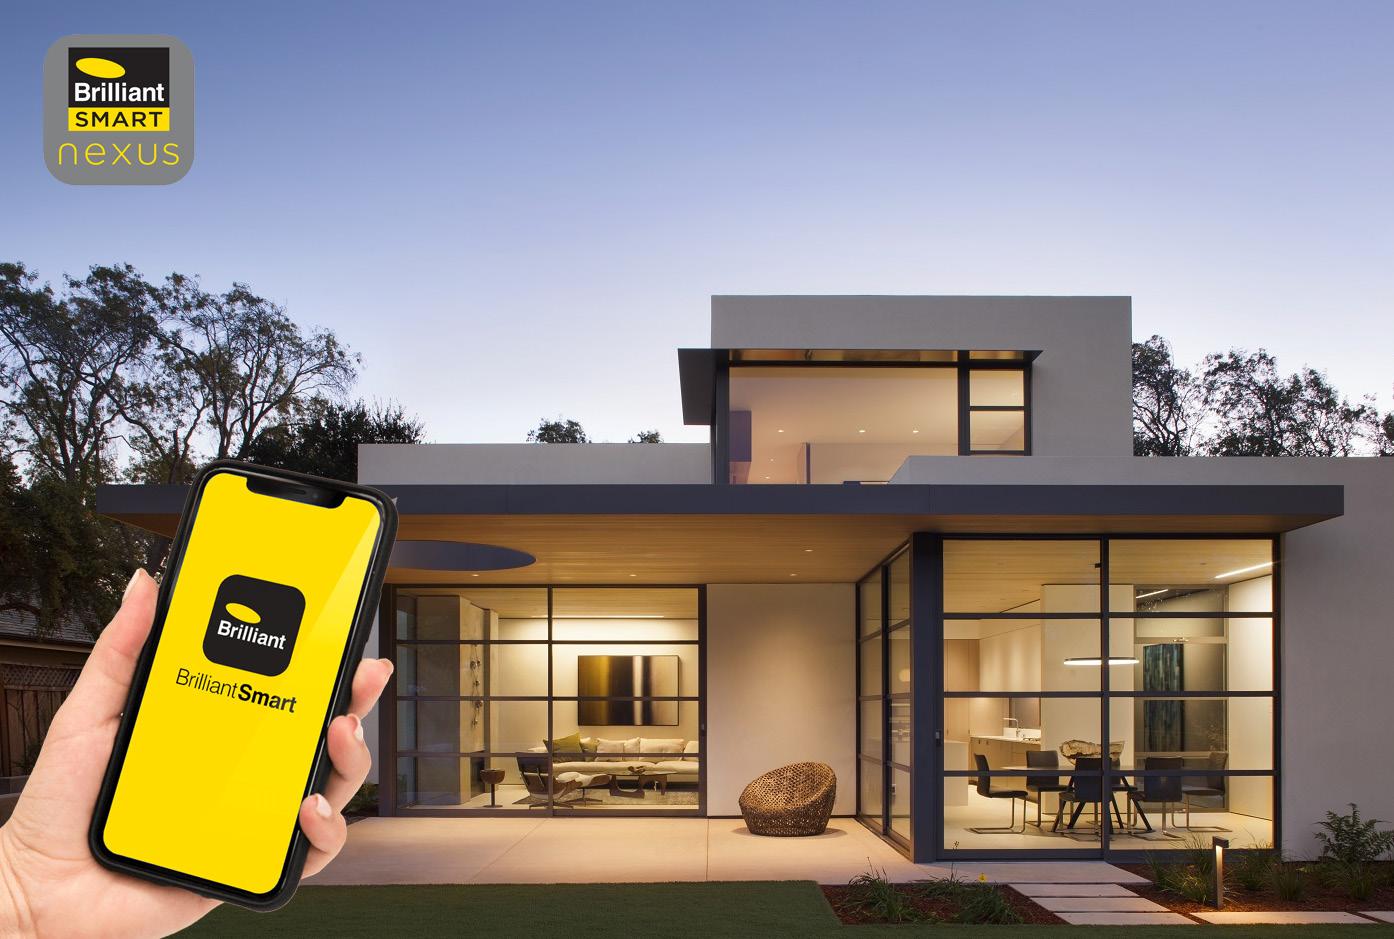 brilliant nexus SmartHouse Best Of The Best Awards 2020: Smart Home Management